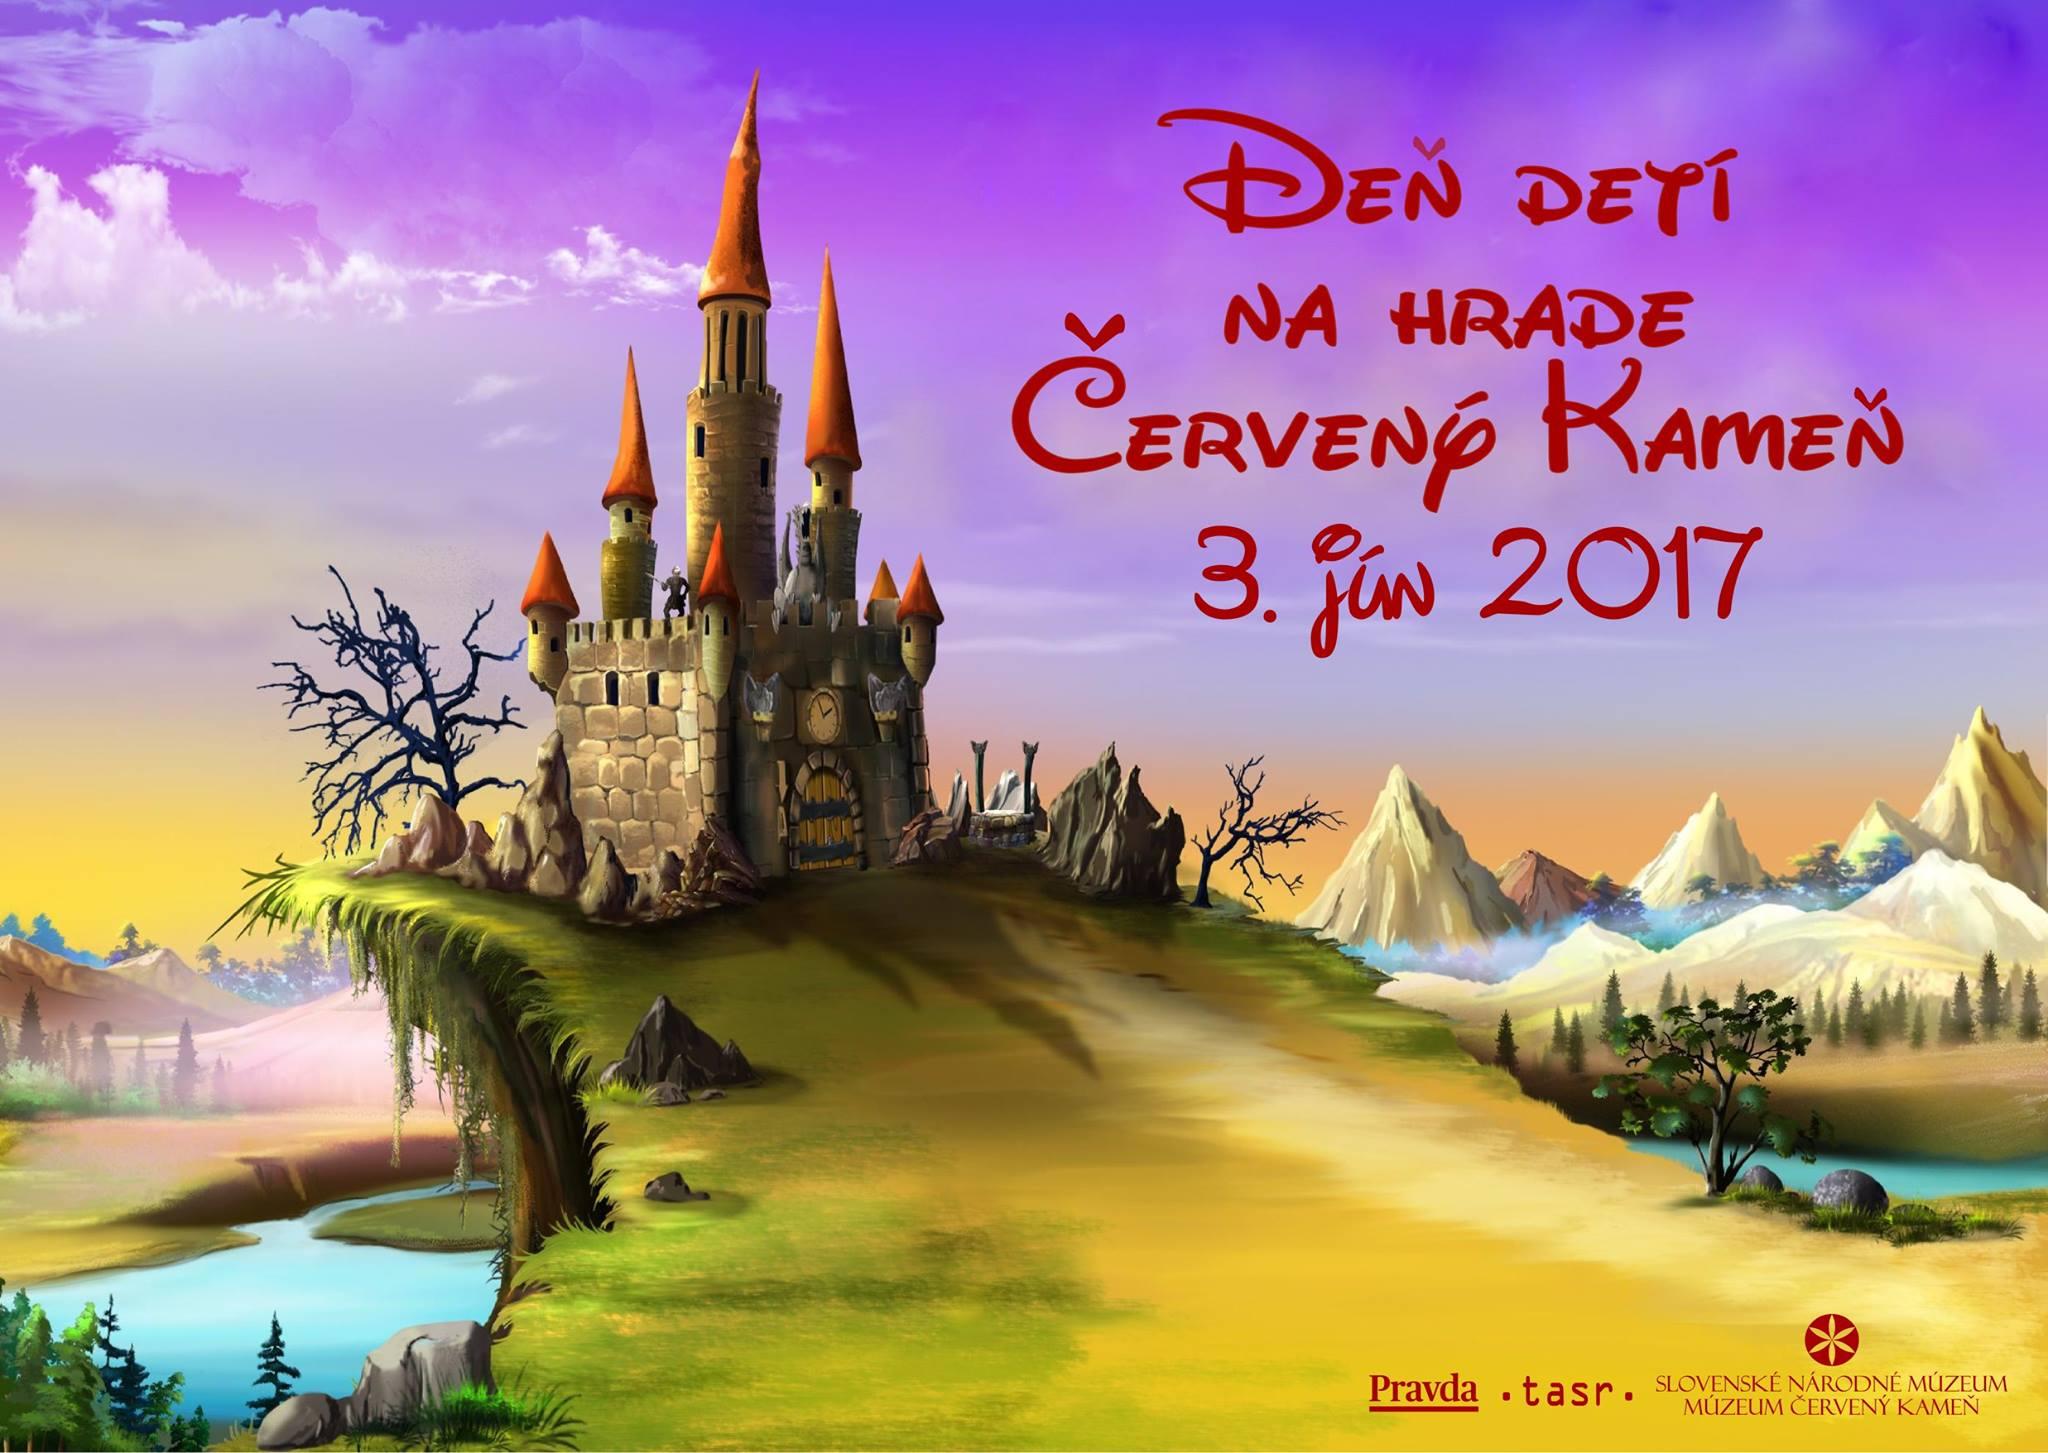 Deň detí na hrade Červený Kameň 2017